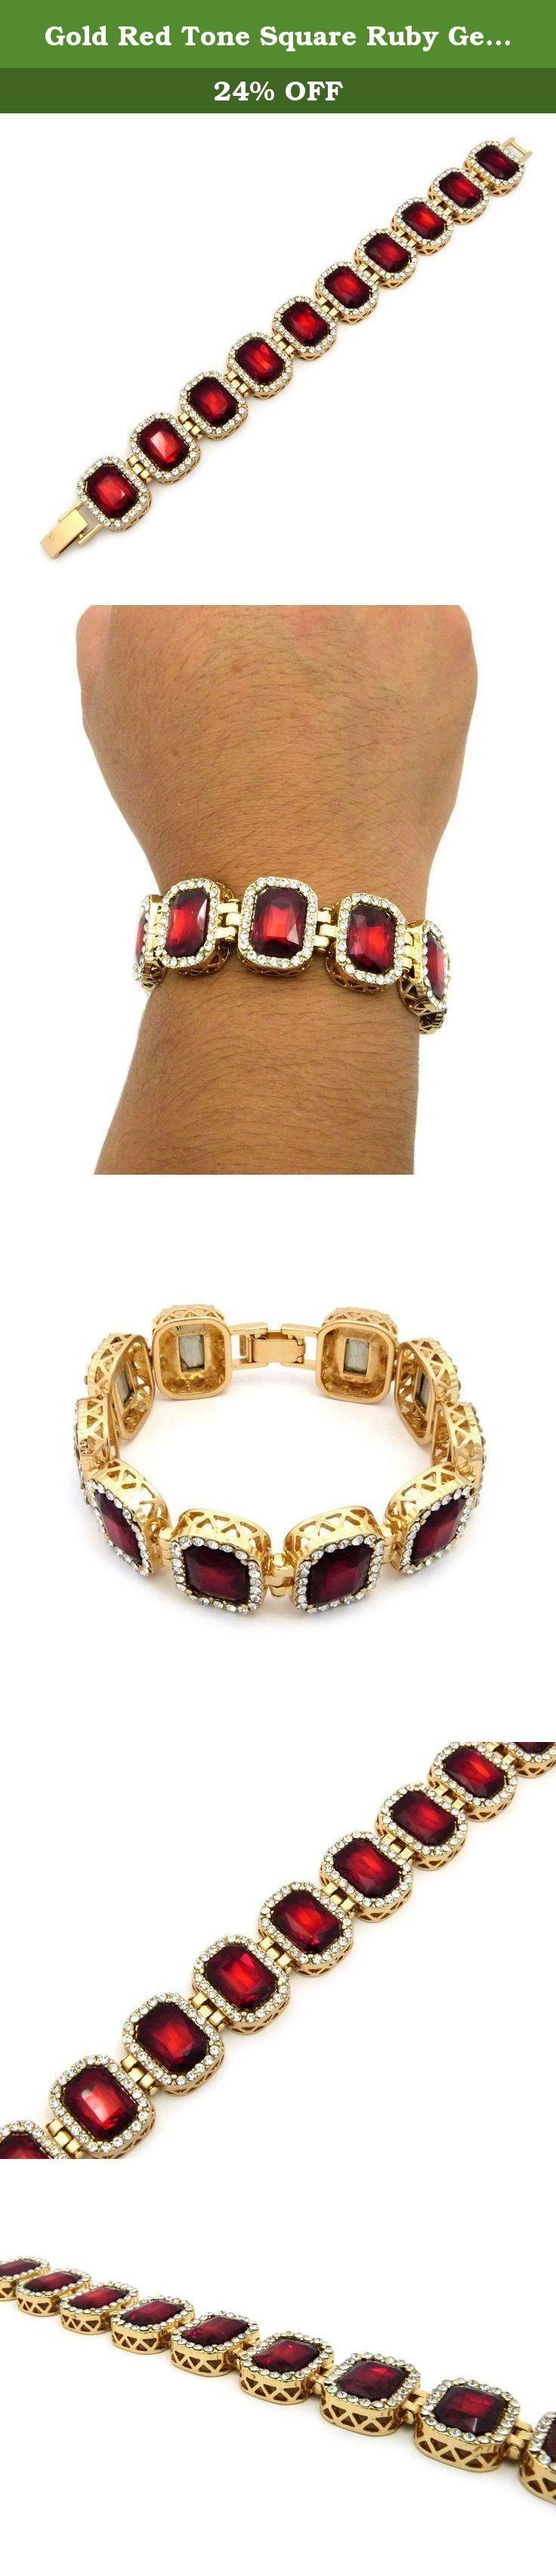 "Gold Red Tone Square Ruby Gemstone 8.25"" Bracelet XB420GRD. Gold Red Tone Square Ruby Gemstone 8.25"" Bracelet."